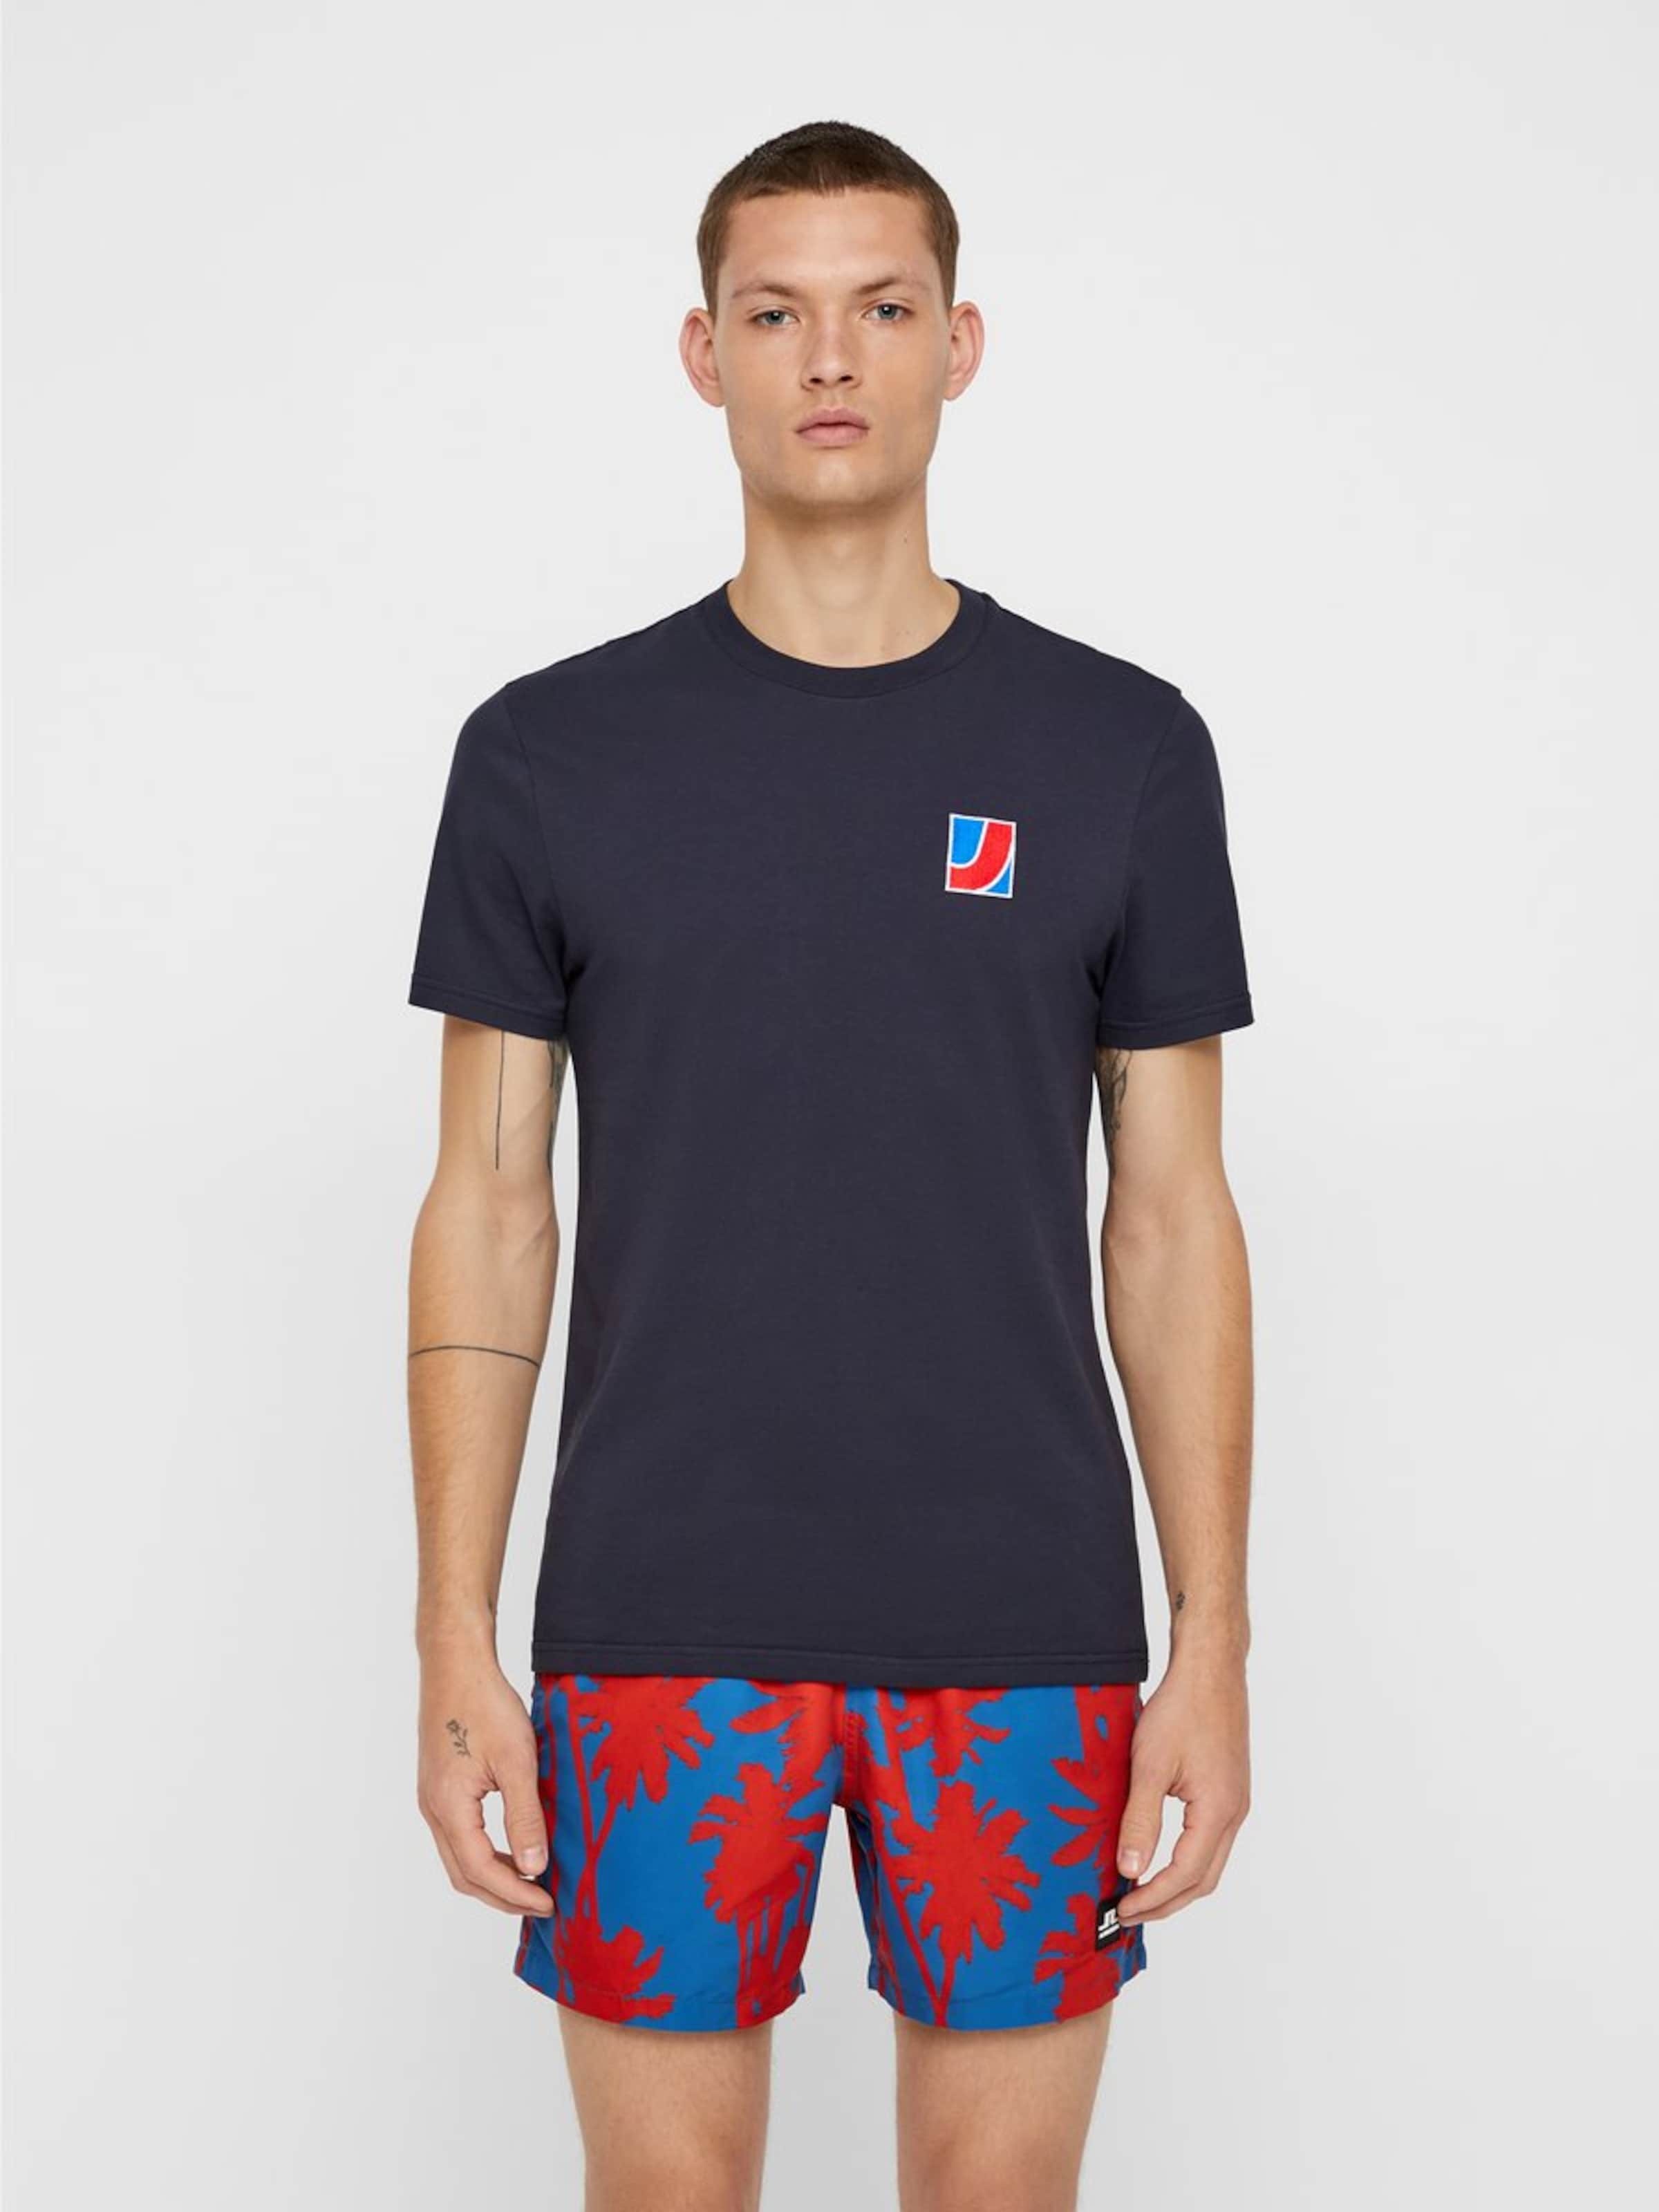 In J 'bridge' lindeberg shirt T Navy 35ARLqj4